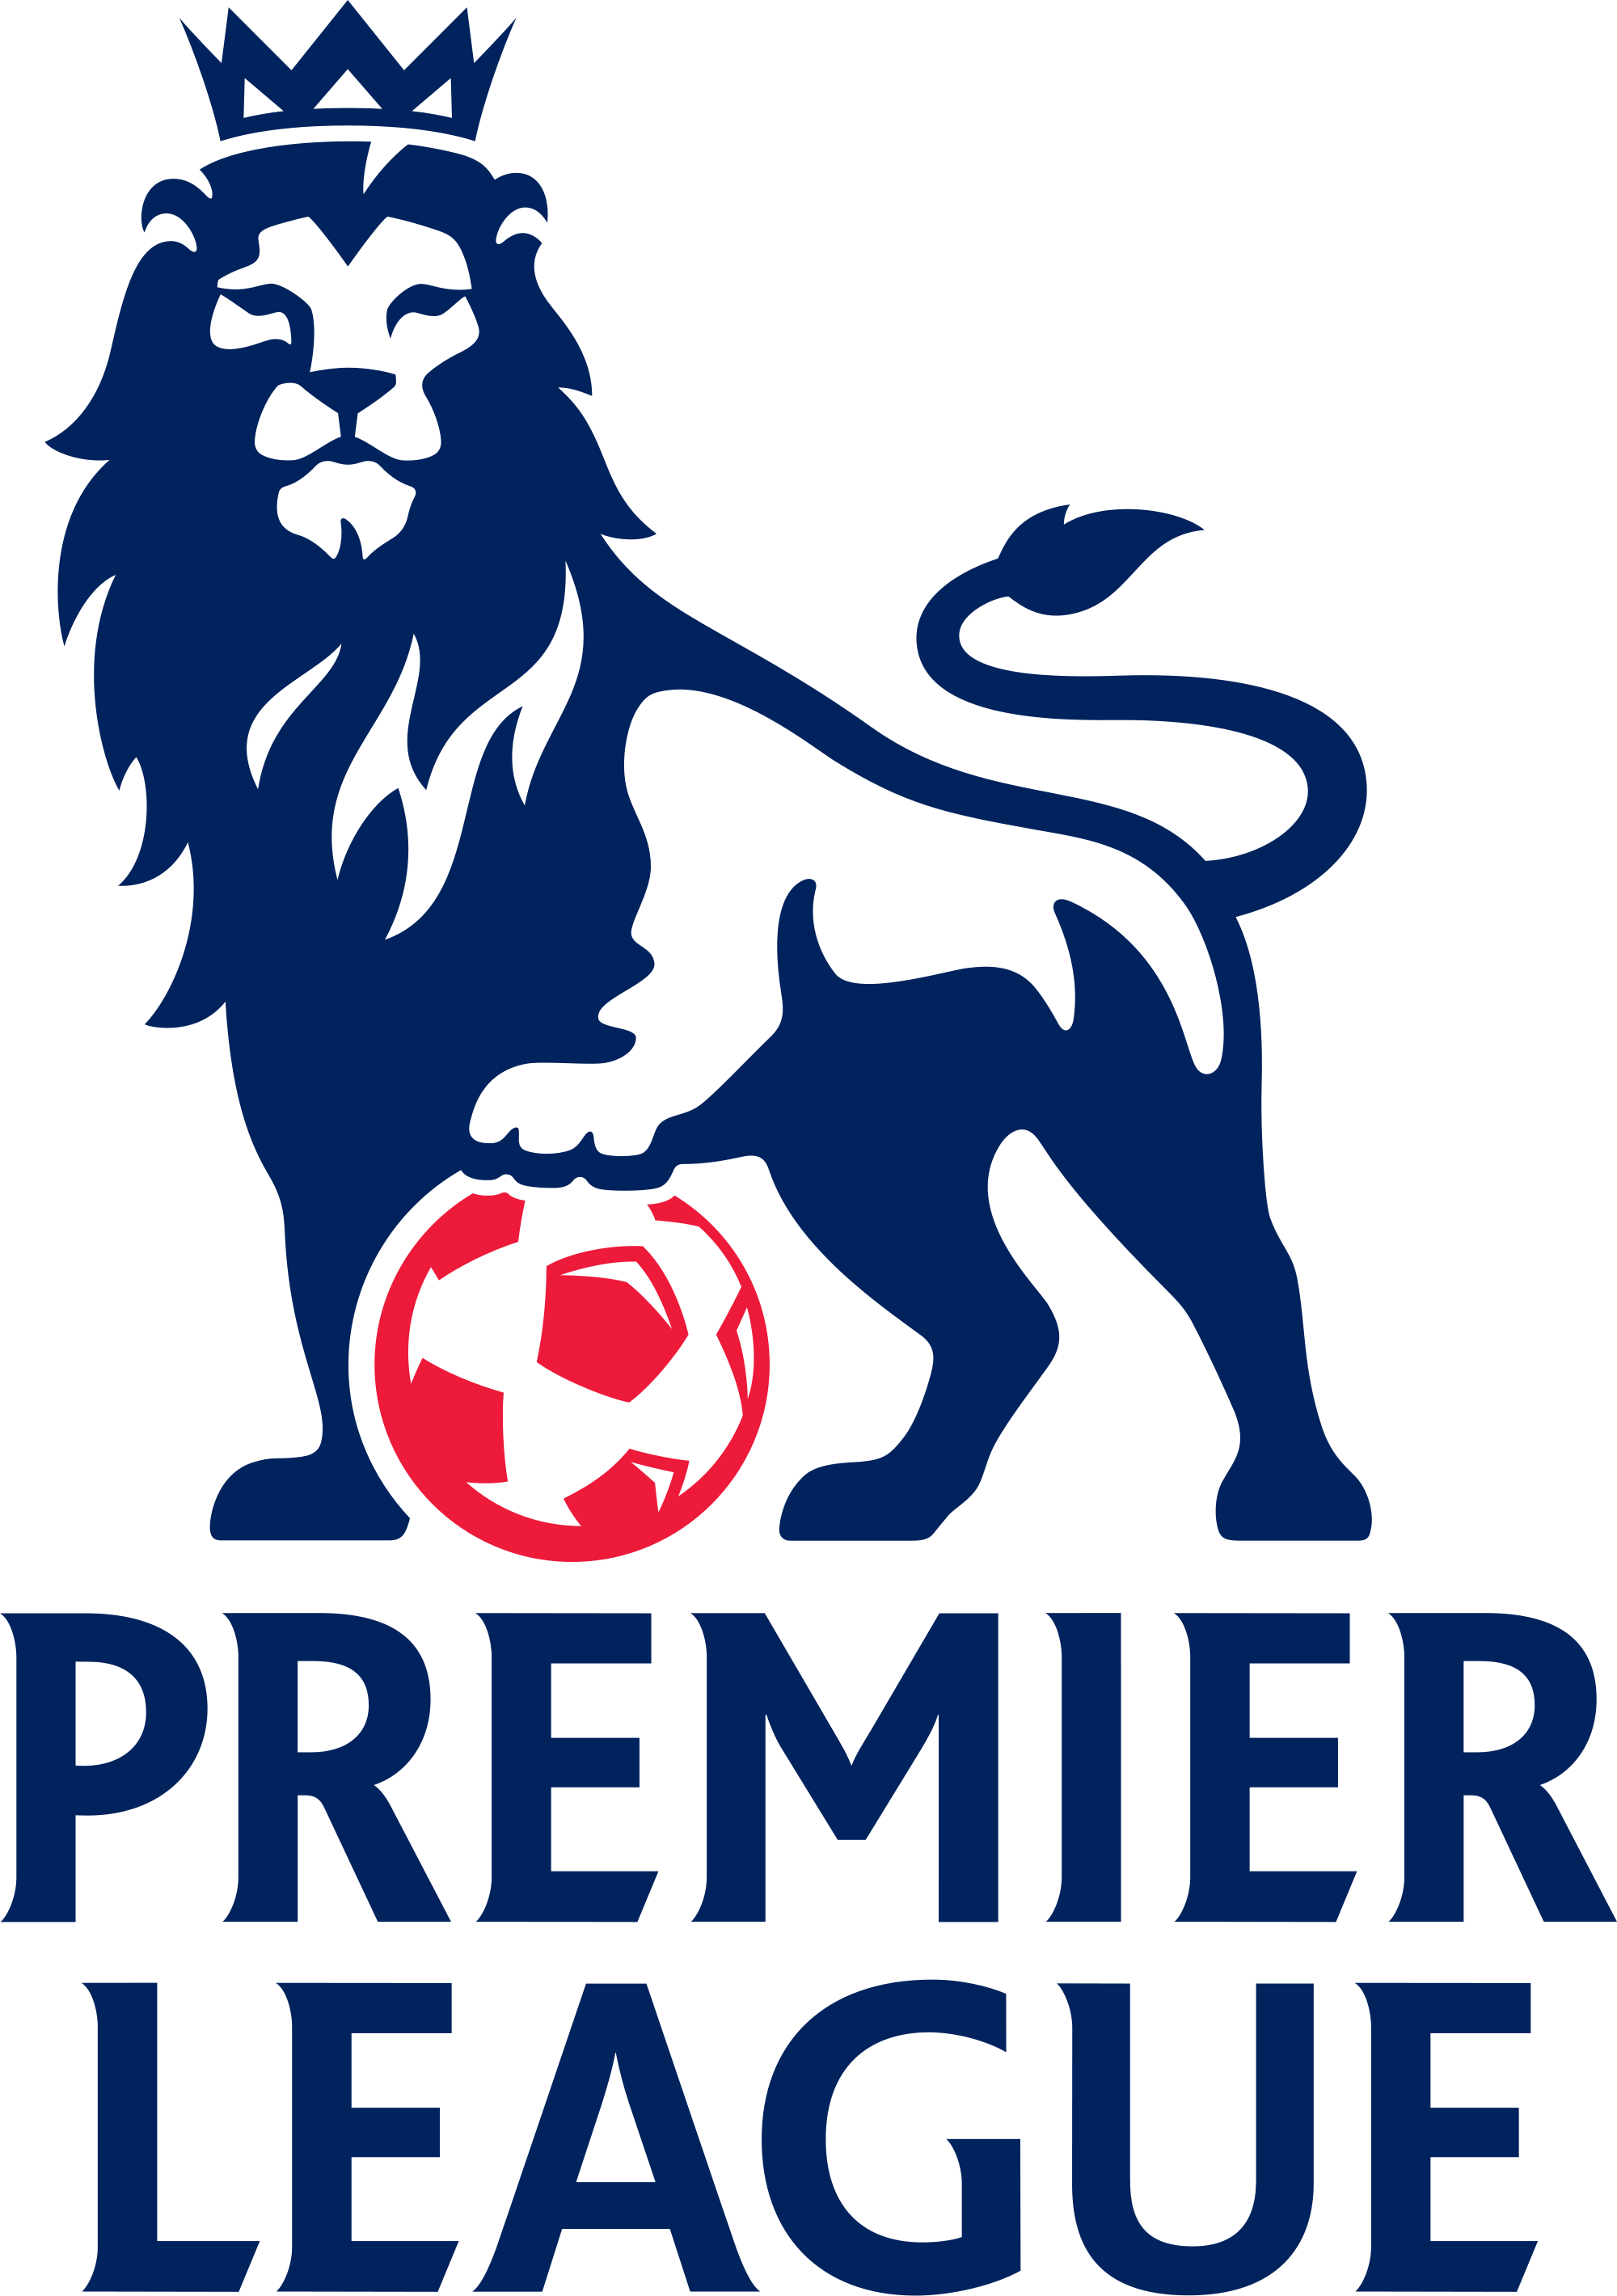 Premier League...go to a game (Liverpool V Manchester